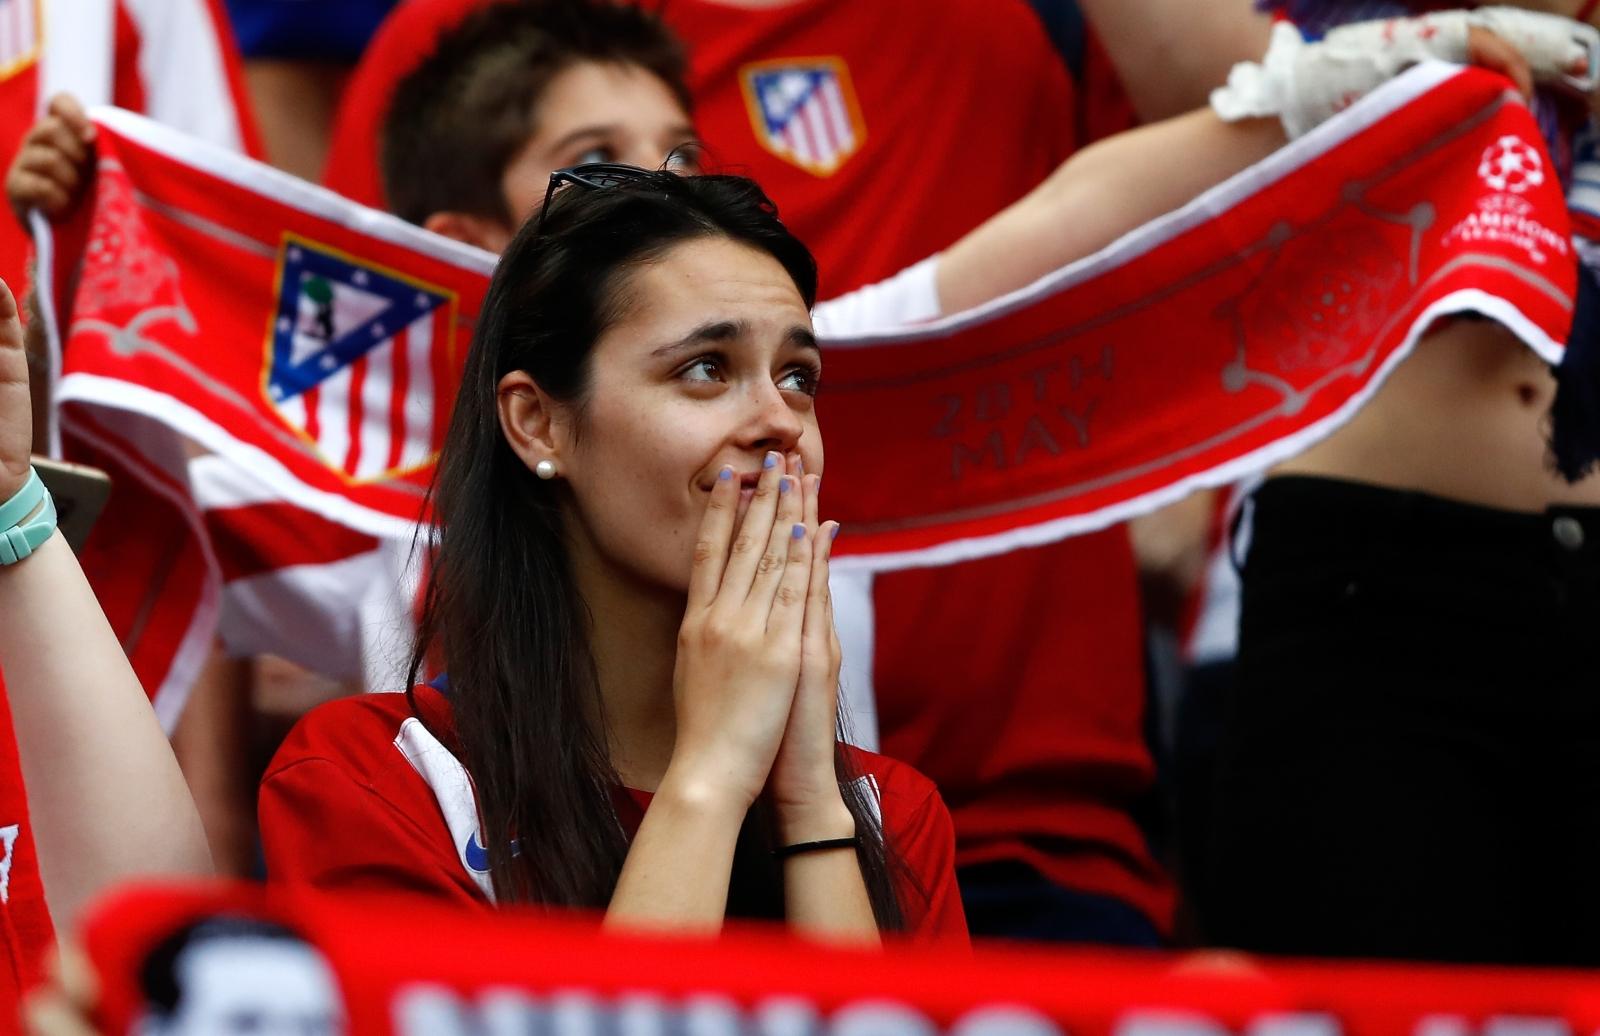 Atletico fans at the San Siro